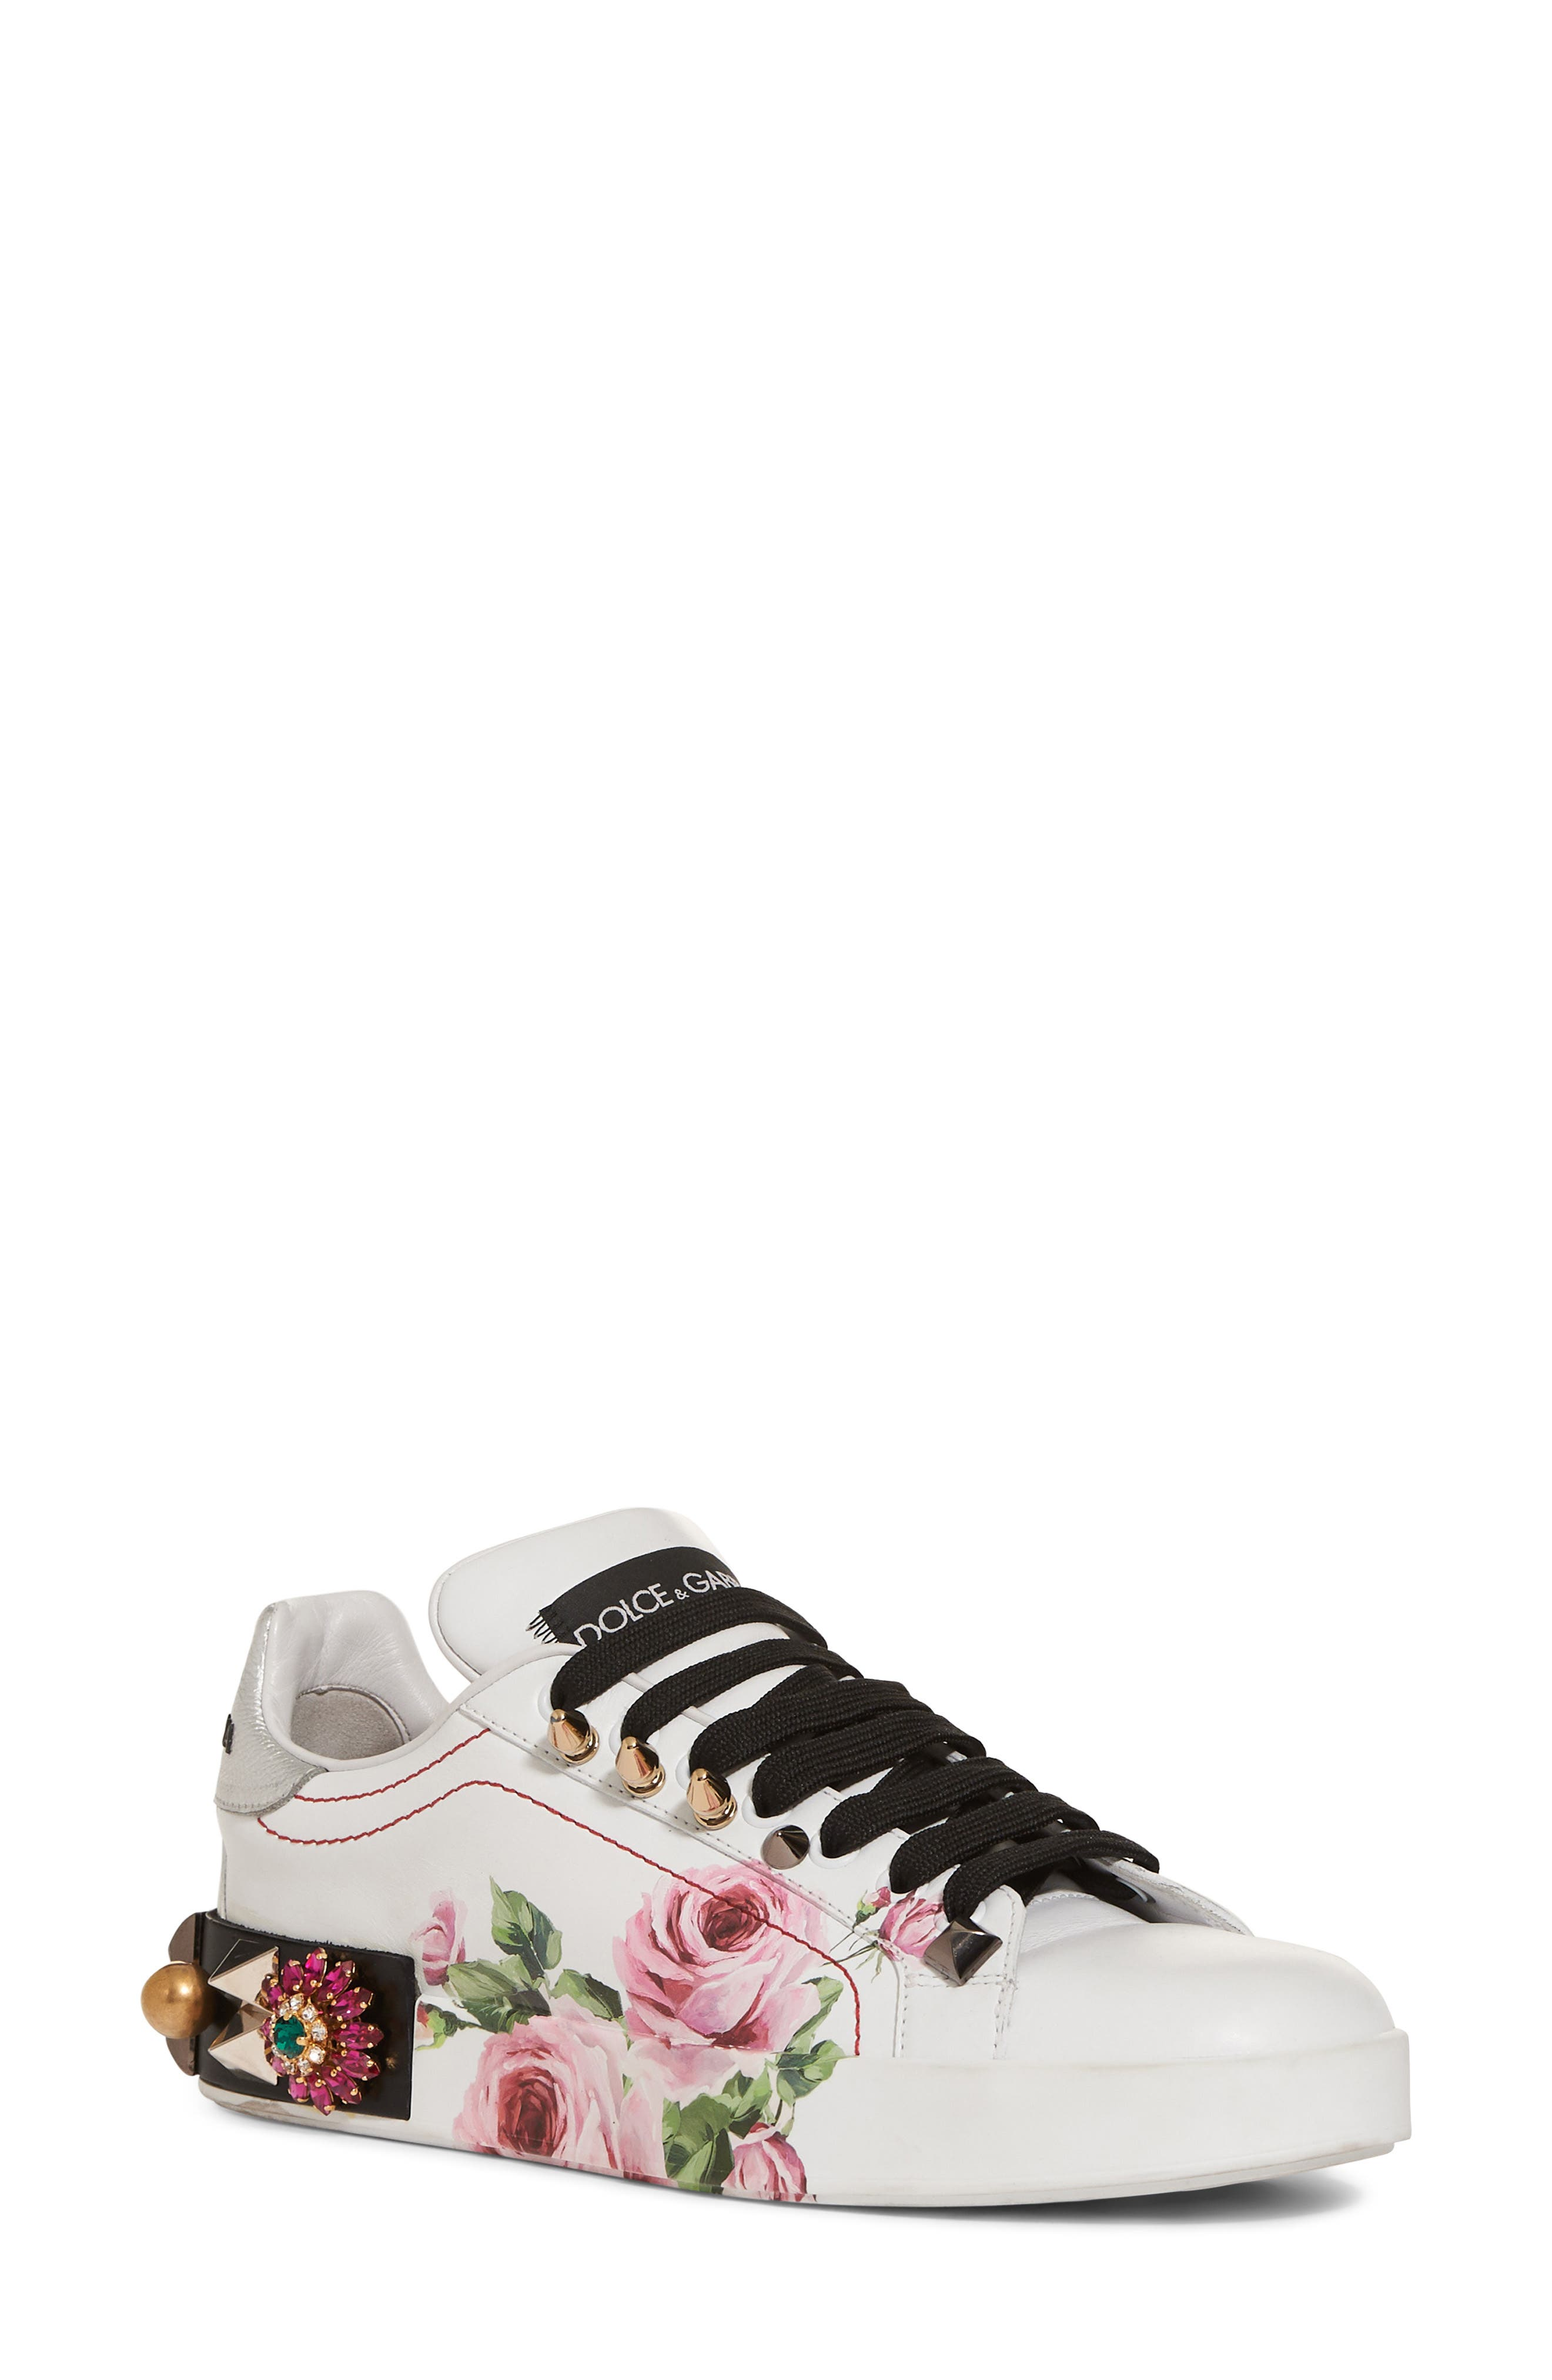 Floral Embellished Sneaker,                             Main thumbnail 1, color,                             White/ Pink Floral